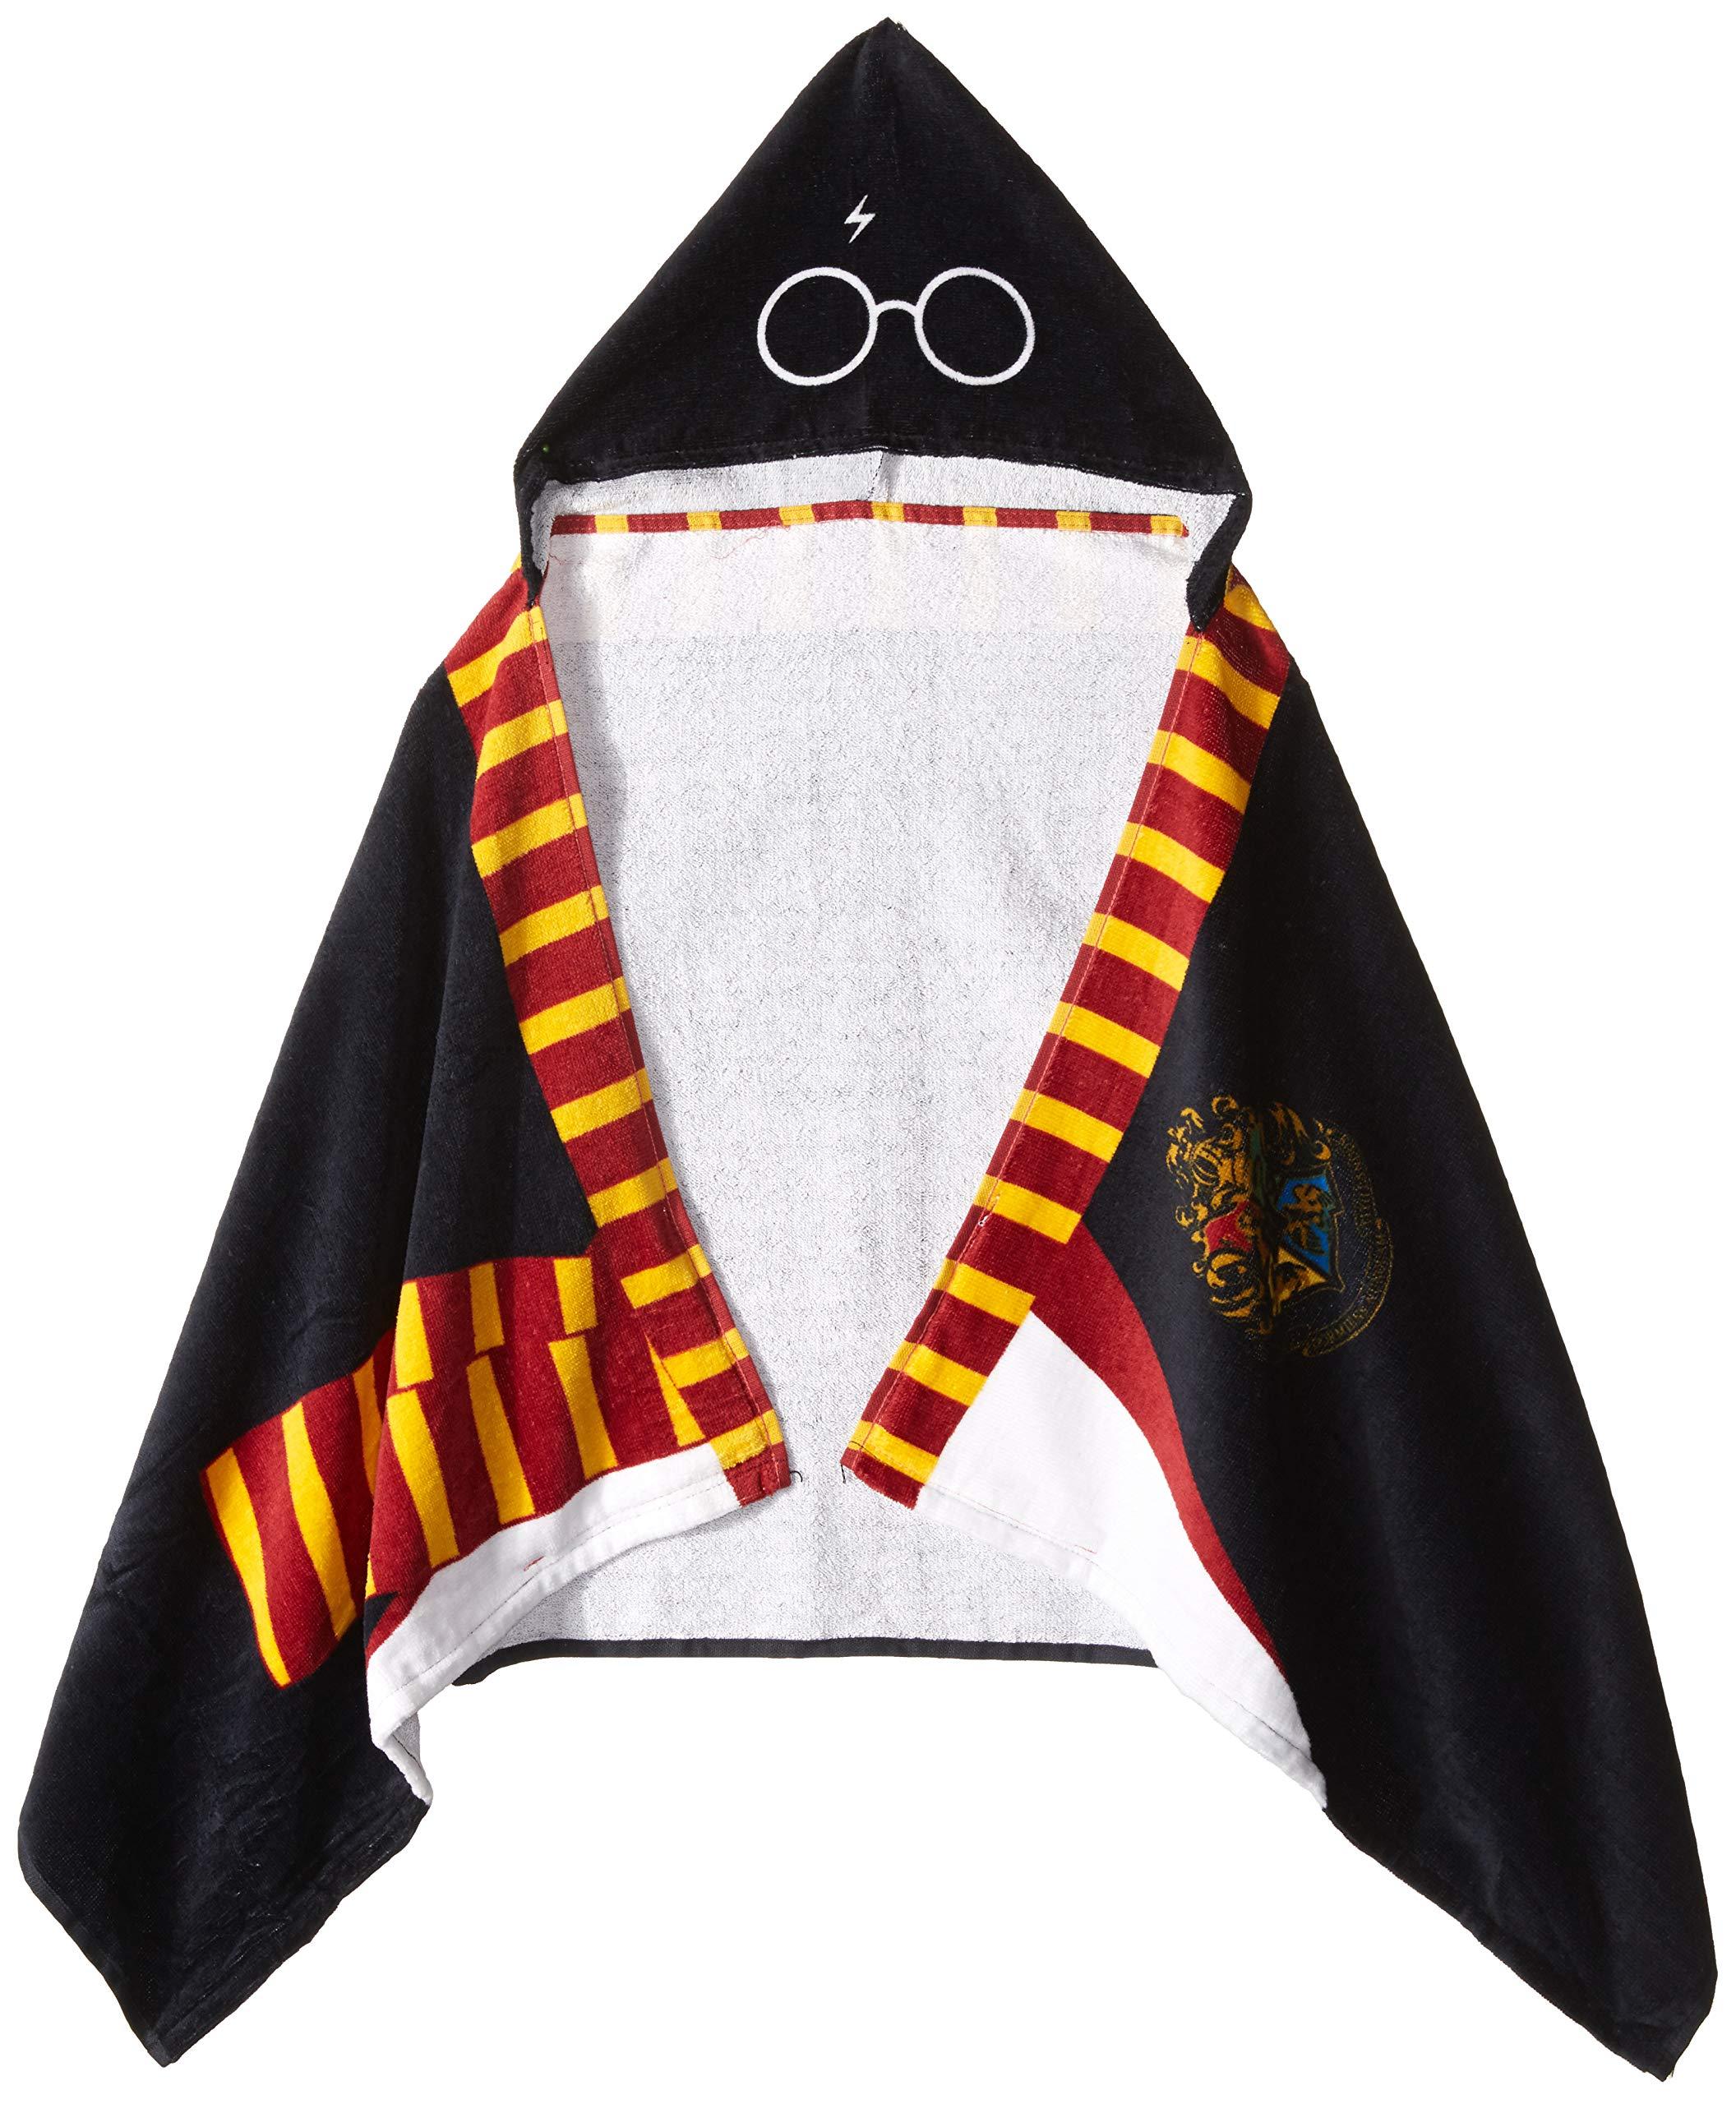 Jay Franco Warner Bros. Harry Potter Hooded Bath/Pool/Beach Towel, Black by Jay Franco